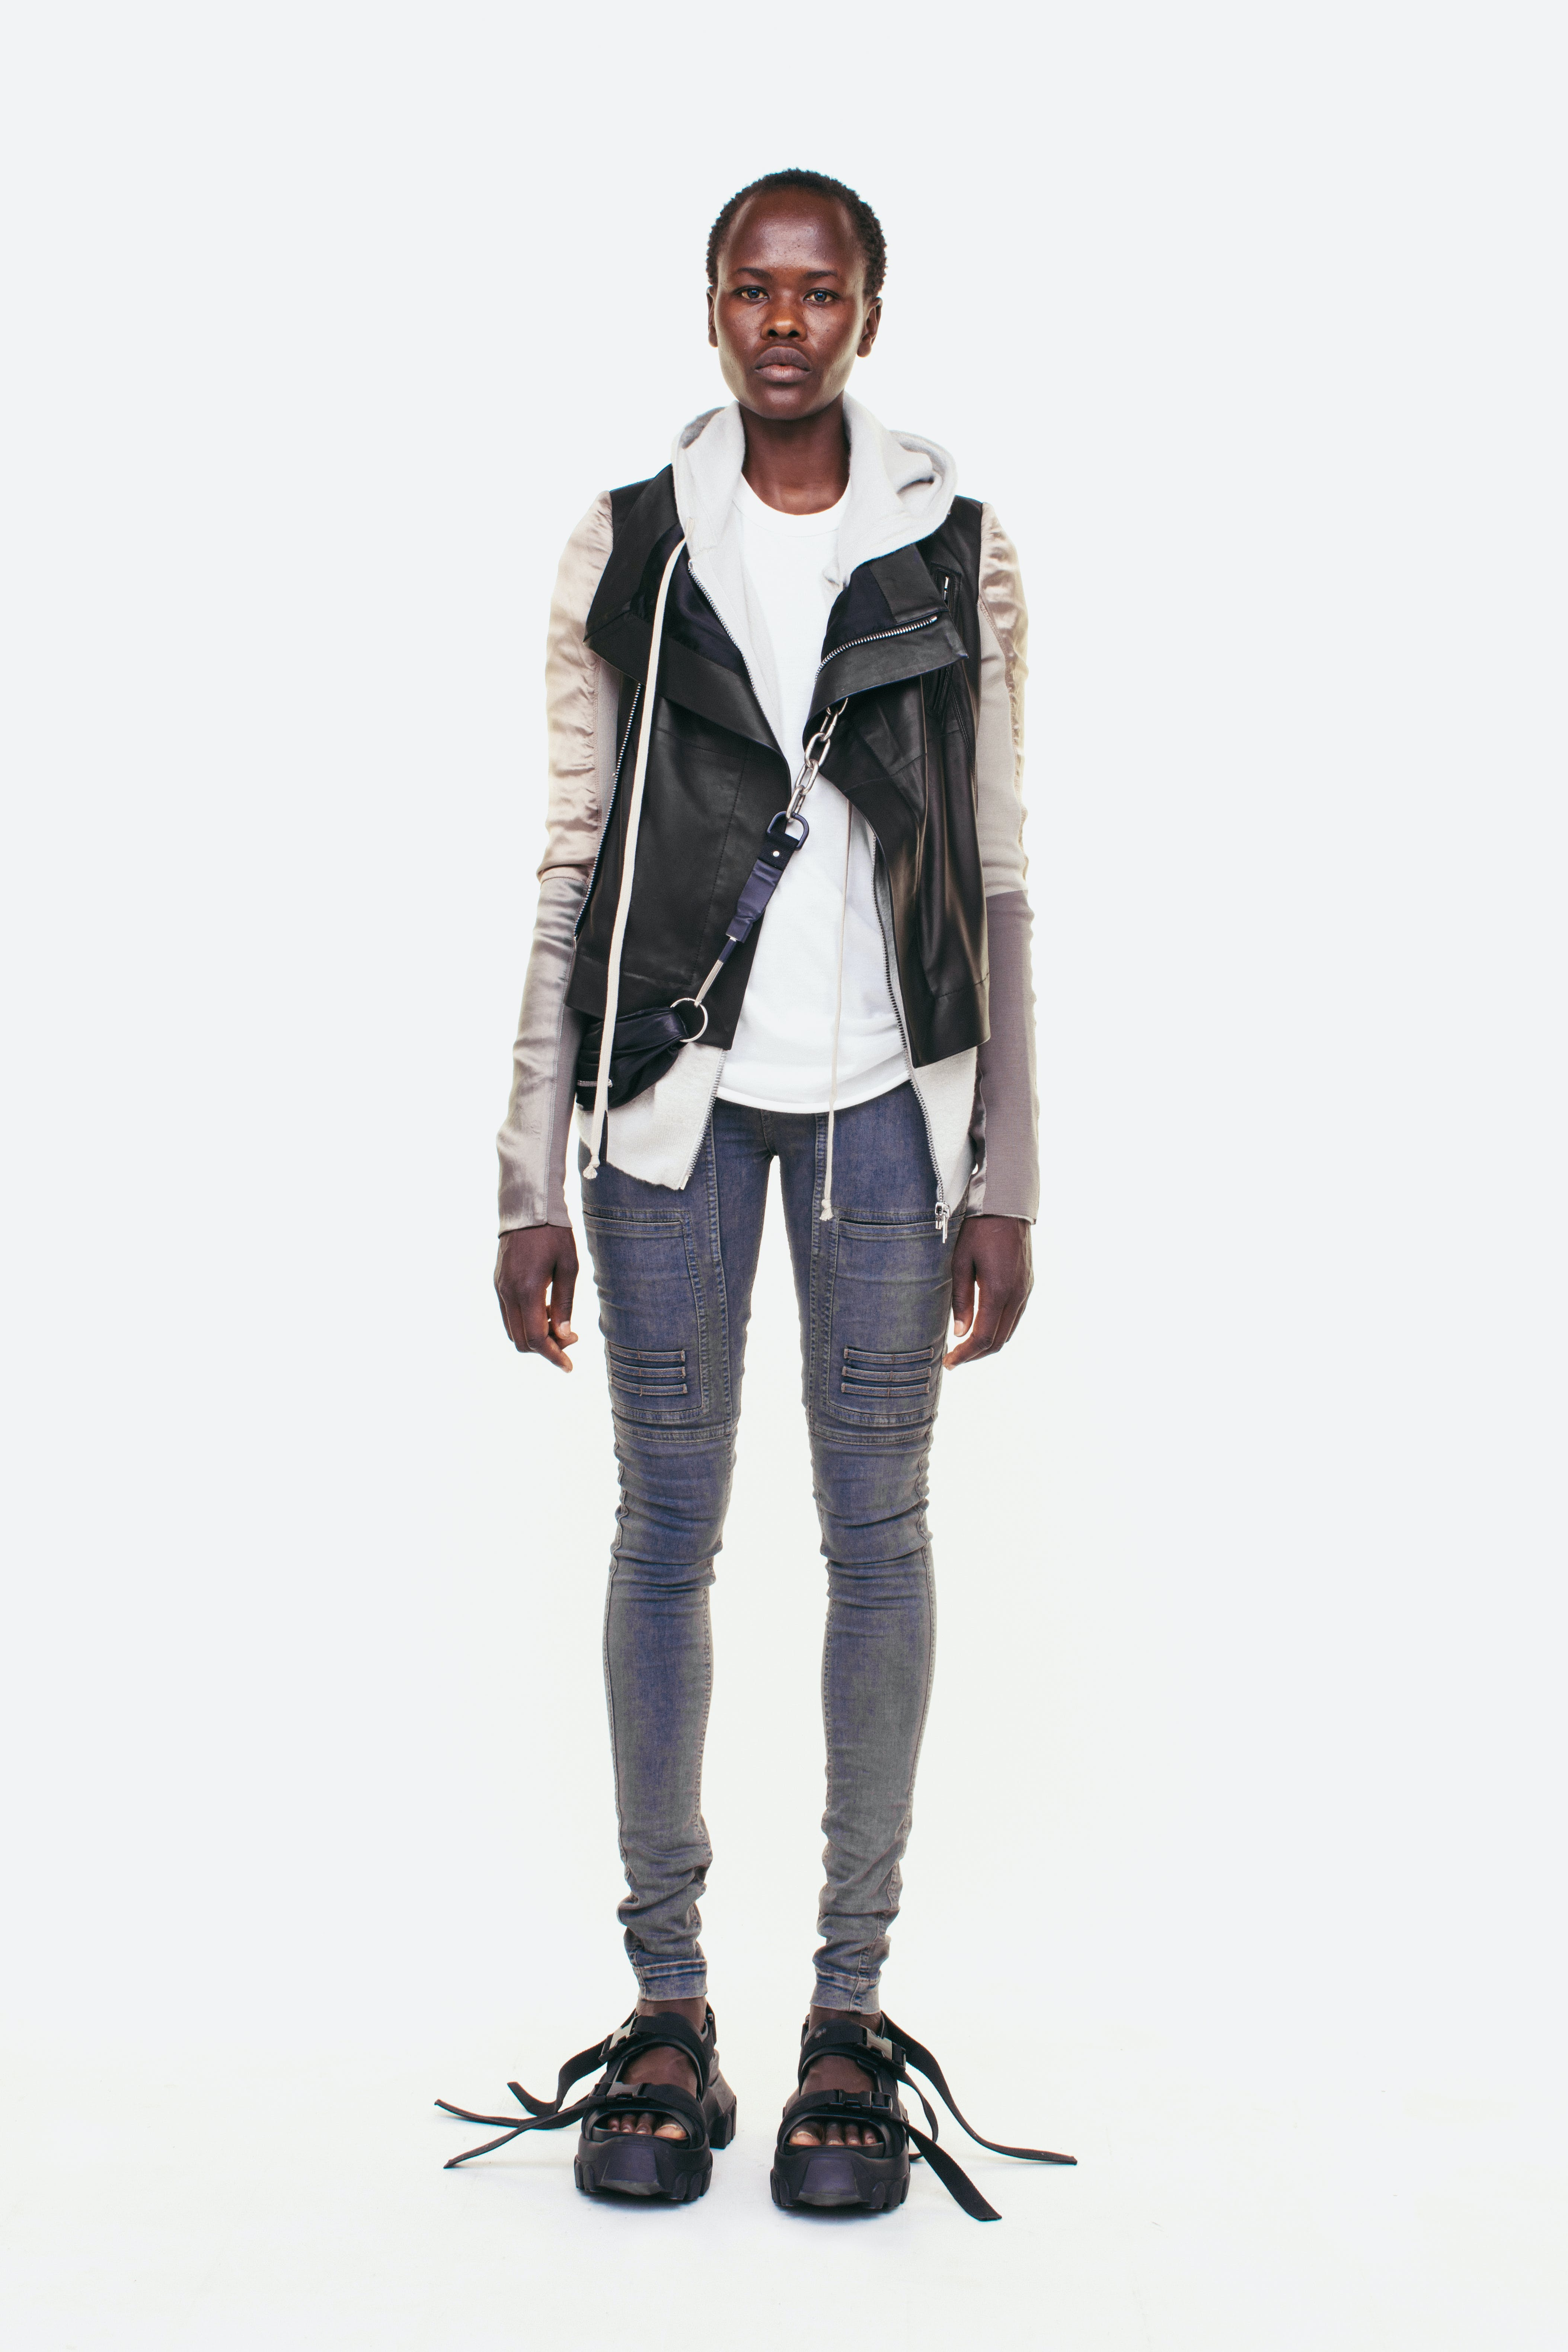 Rick Owens Campaign Zip Up Hoodie In Grey Biker Silk Sleeve Jacket Biker Jeans in Washed Denim Long Strap Sandals in Black Womens SS19 Pre Collection